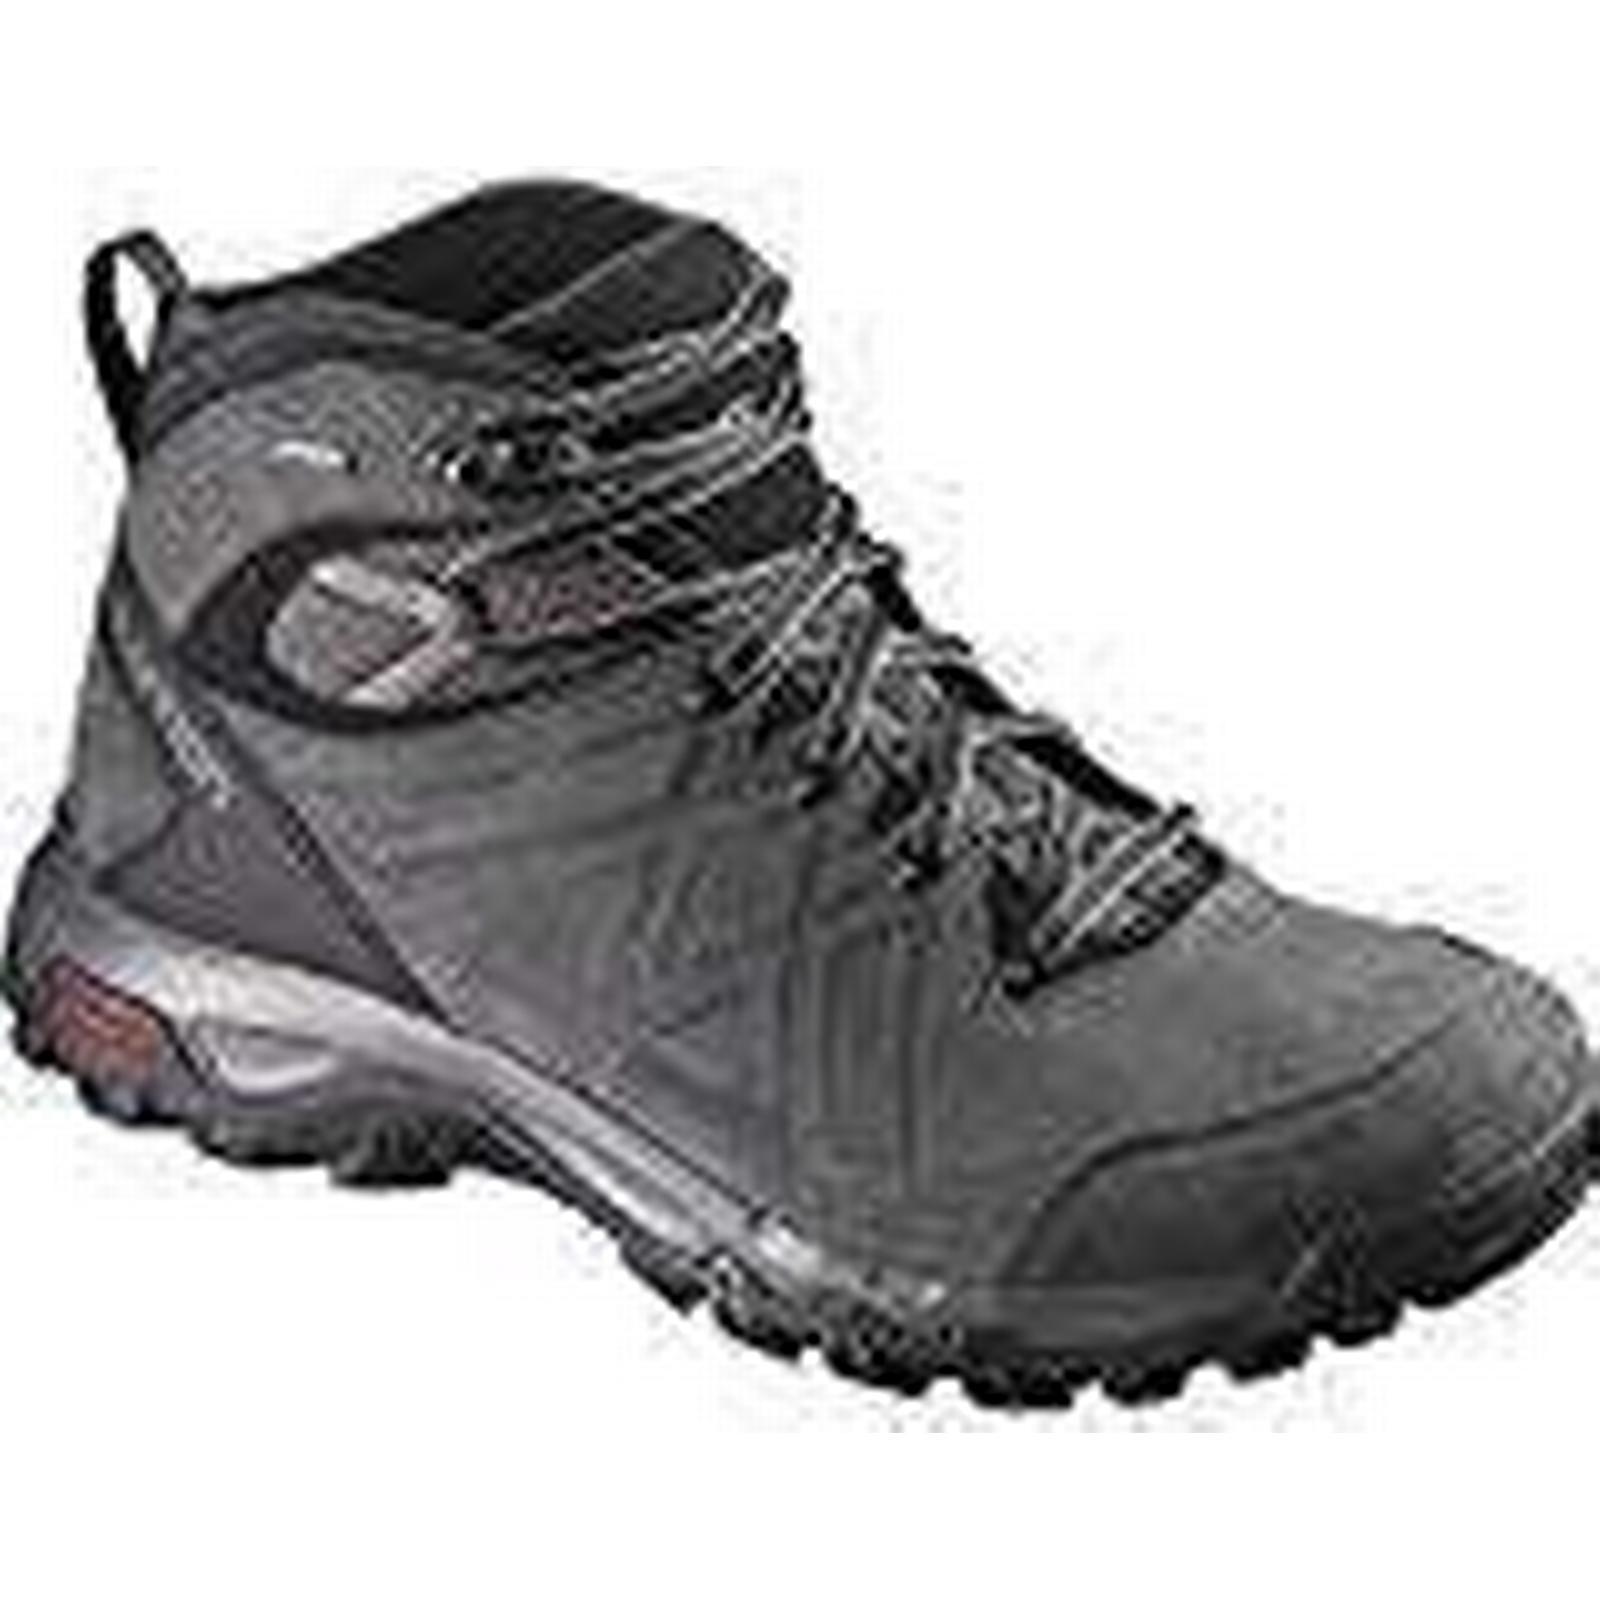 Salomon Men's Evasion 2 Mid Ltr Gtx Hiking and Multifunction 10 Shoe, Grey (Magnet/Phantom/Quiet Shade), 10 Multifunction UK (44 2/3 EU) 4e8d50